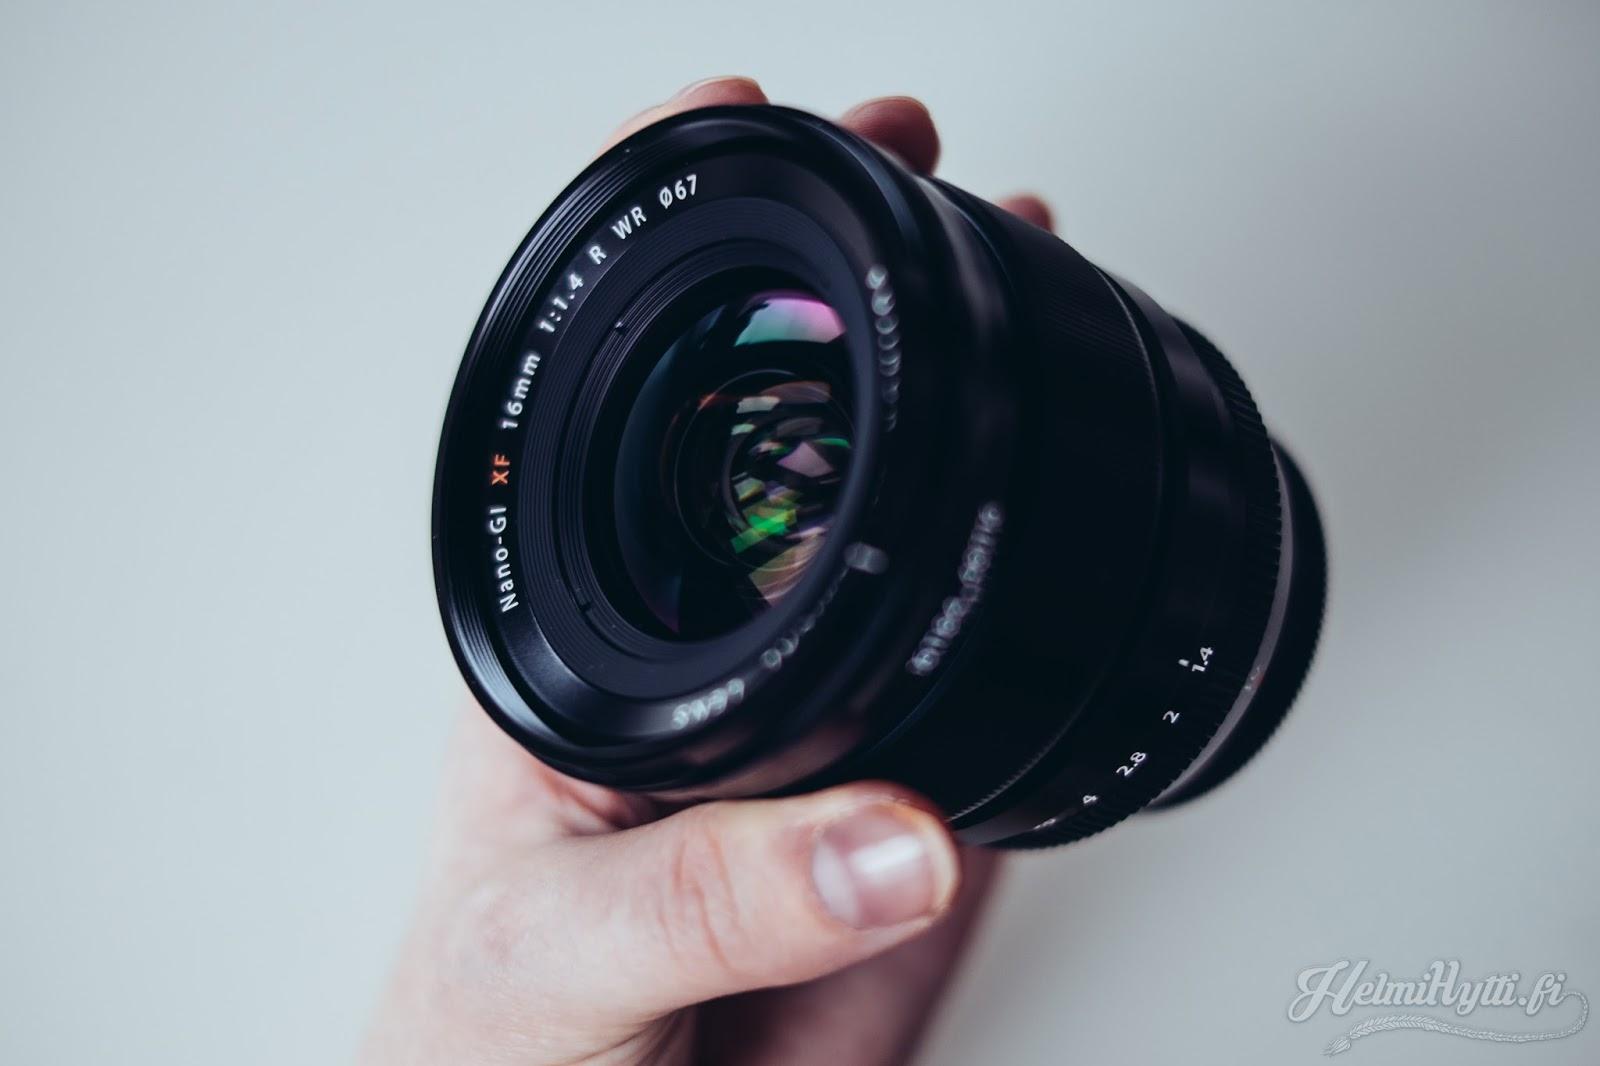 id testi fujinon 16 mm f 1.4 laajakulma wide lens